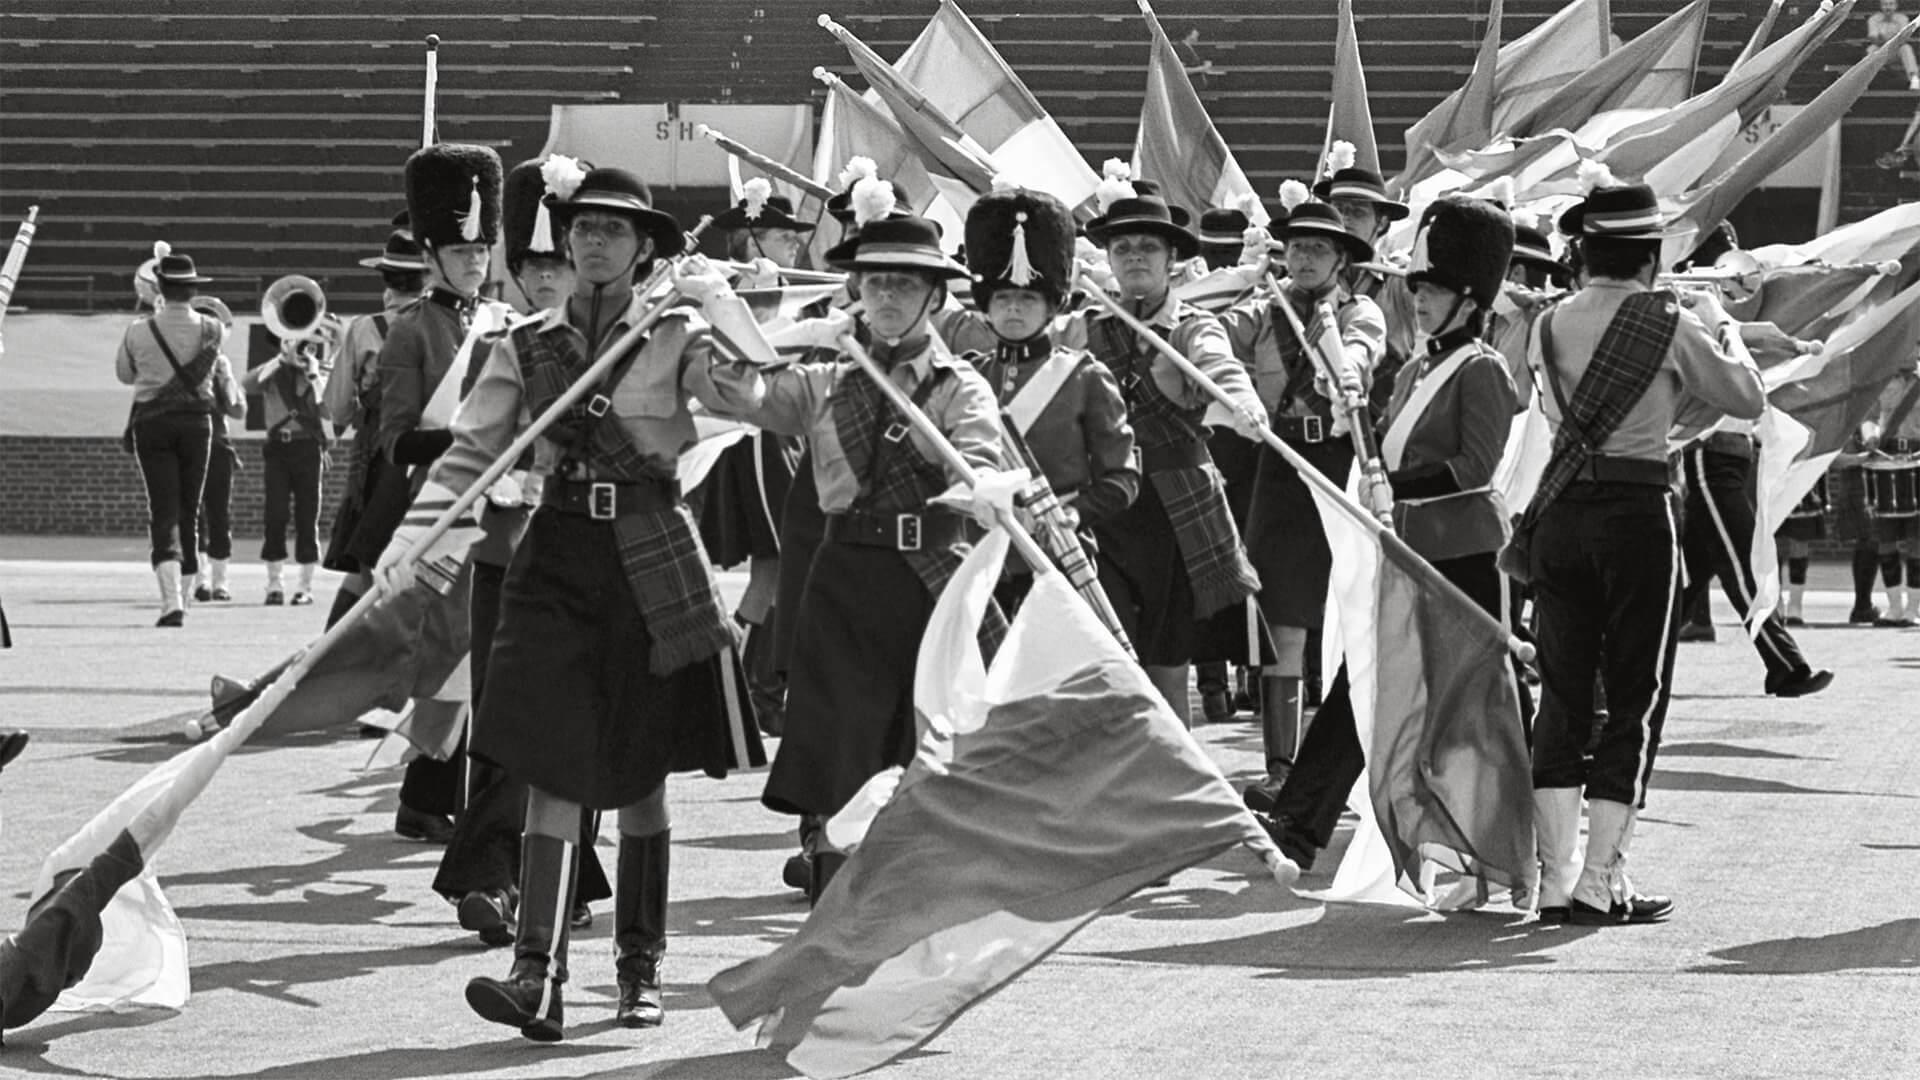 1976 27th Lancers